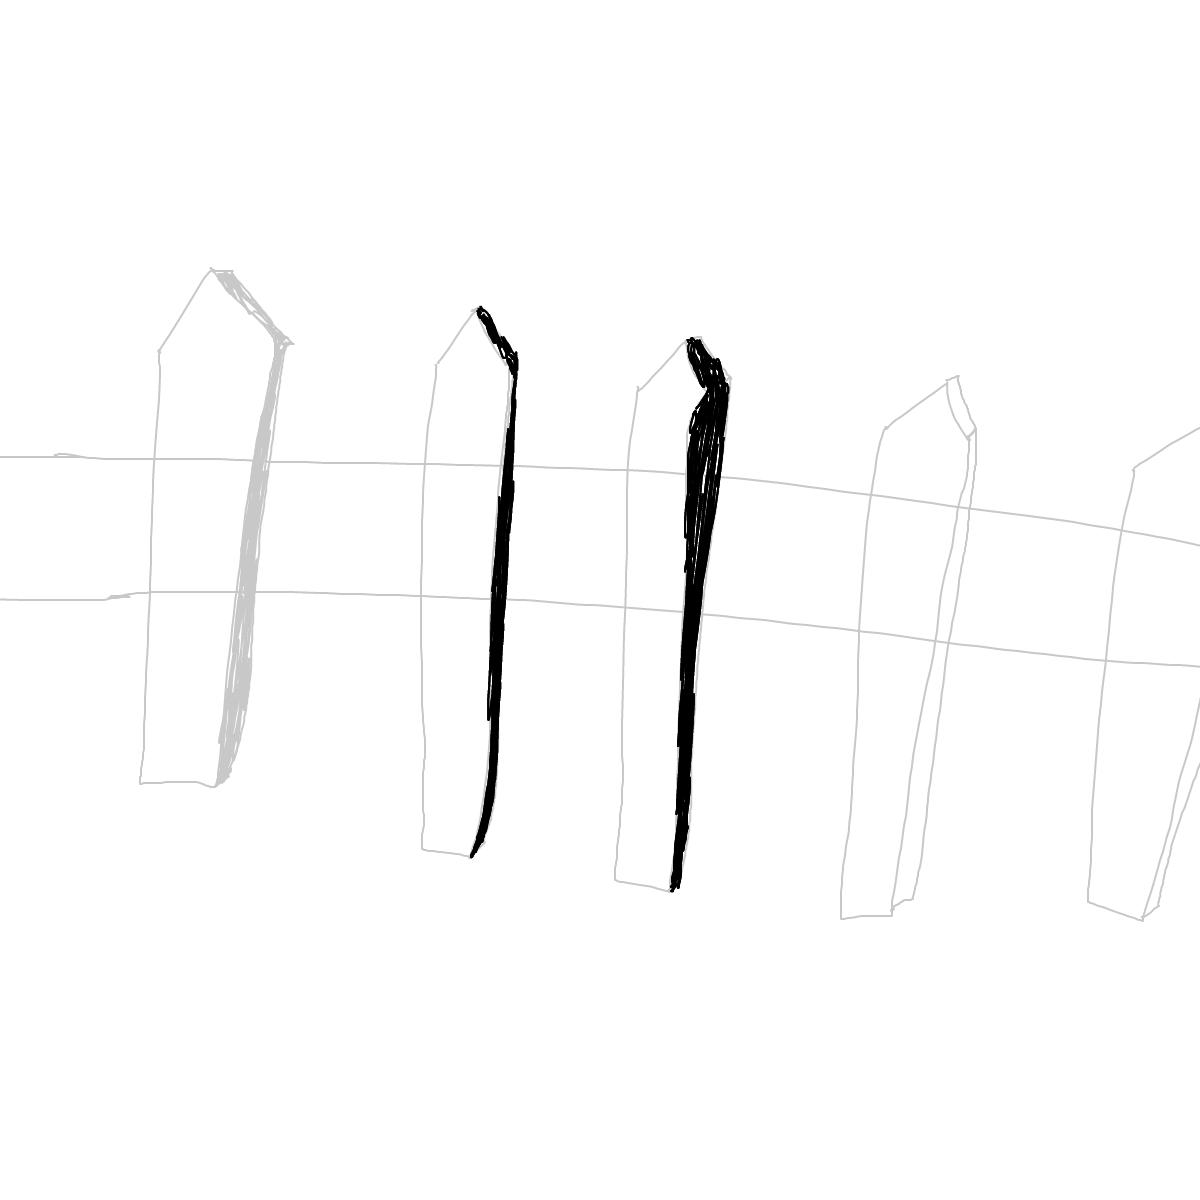 BAAAM drawing#9373 lat:52.4750556945800800lng: 13.4071140289306640